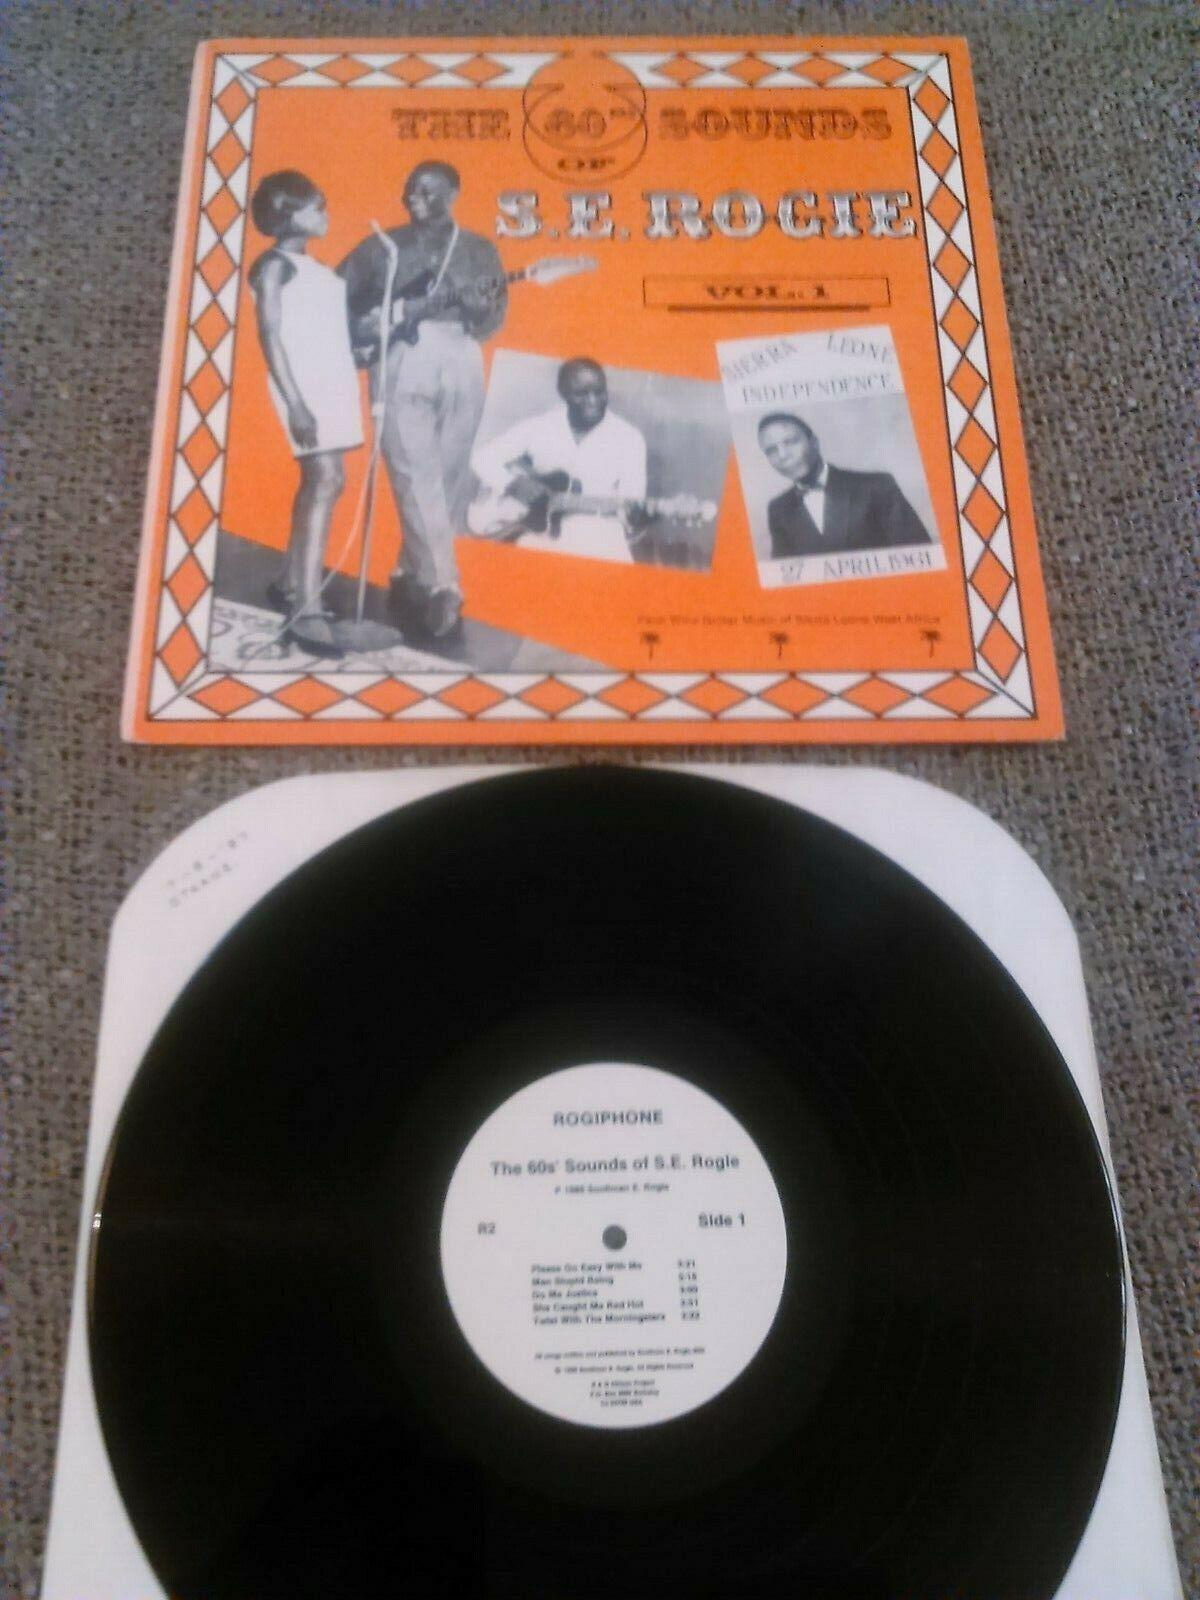 S.E ROGIE - THE 60s SOUNDS OF ... LP N. MINT!!! ORIGINAL U.S ROGIPHONE PALM WINE